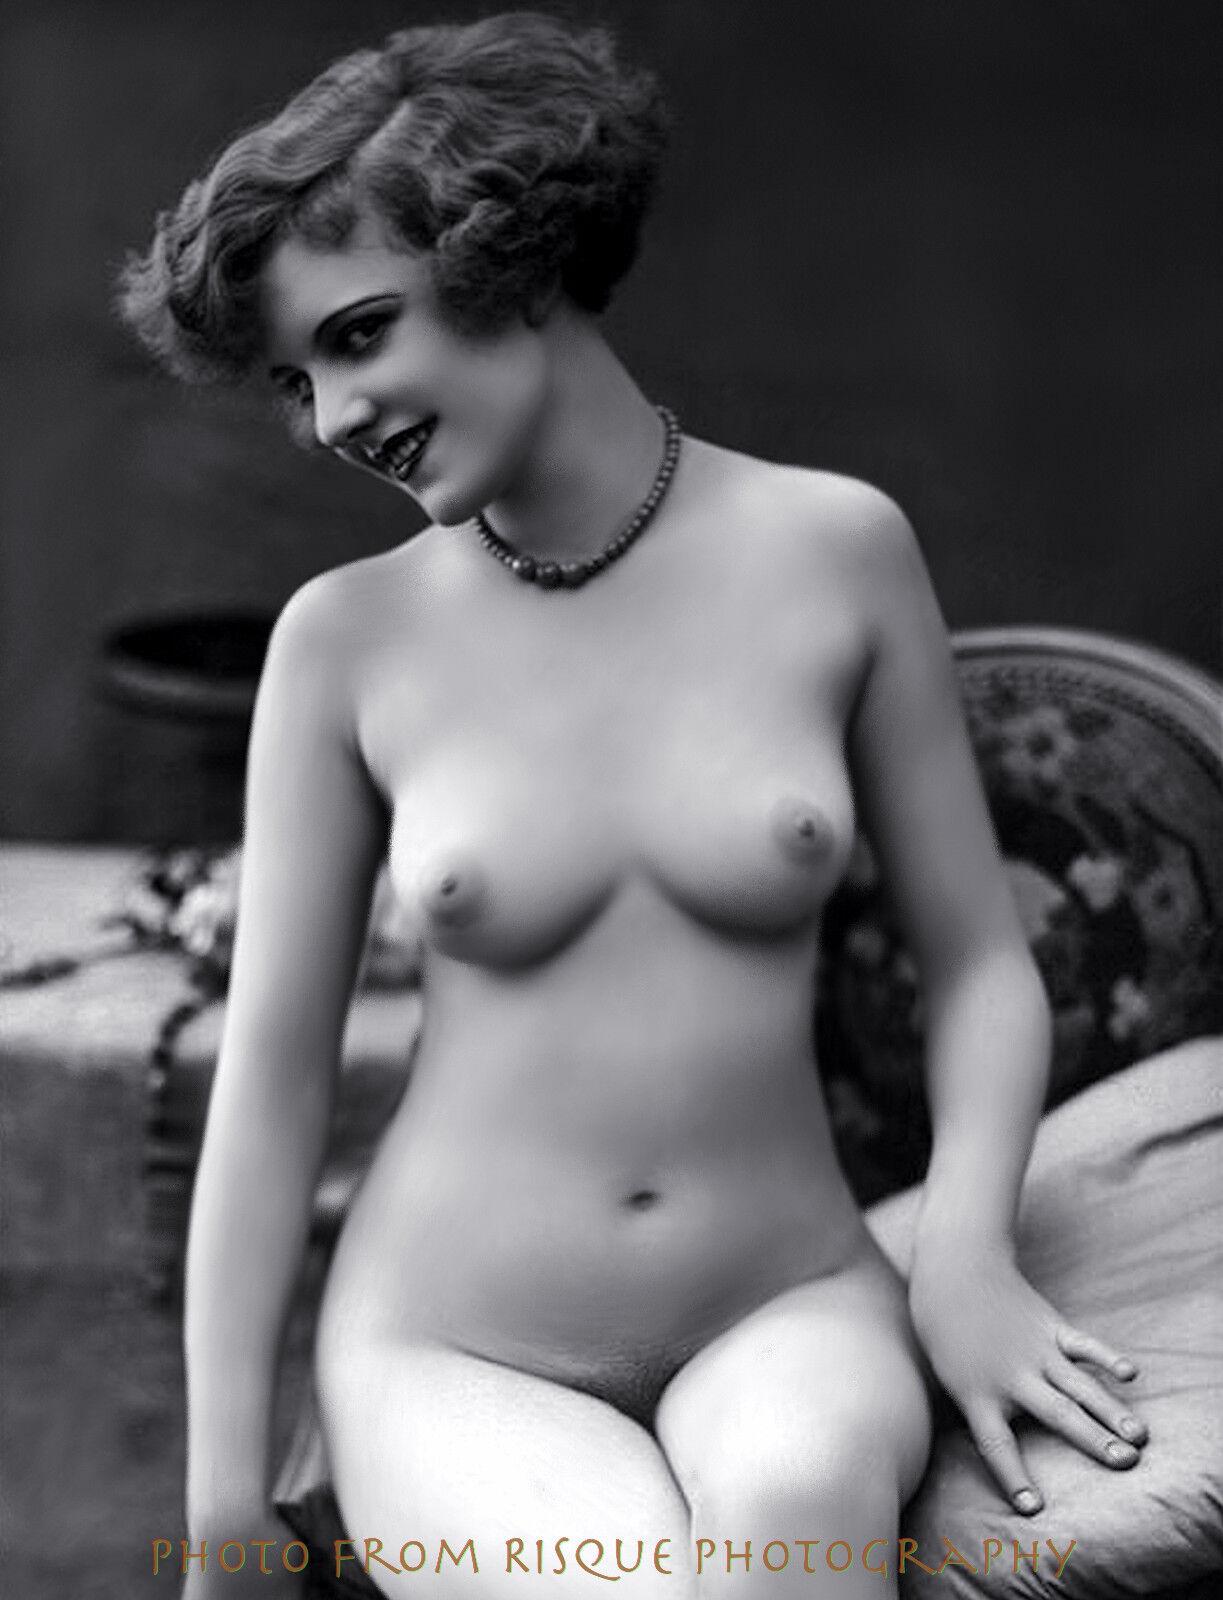 Retro women nude